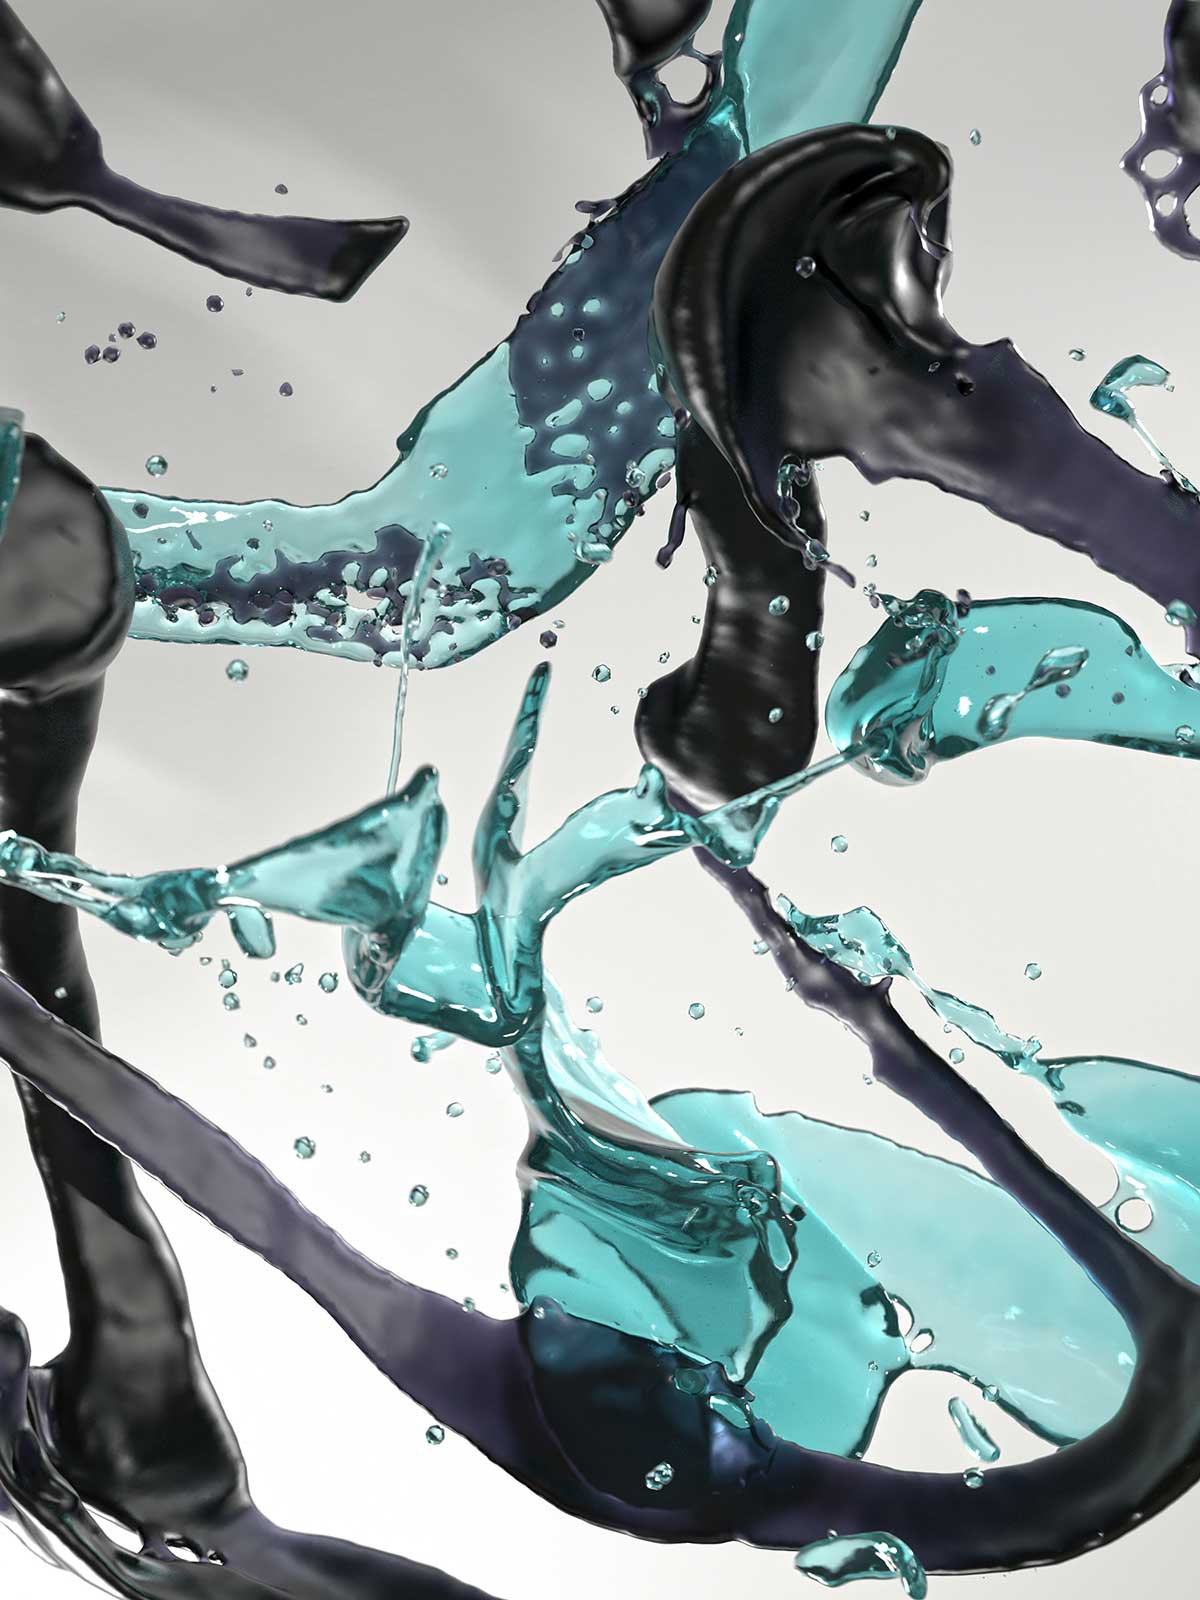 Bodypaint IV 07, CGI Fine Art Print, 108 x 81 cm, 2016